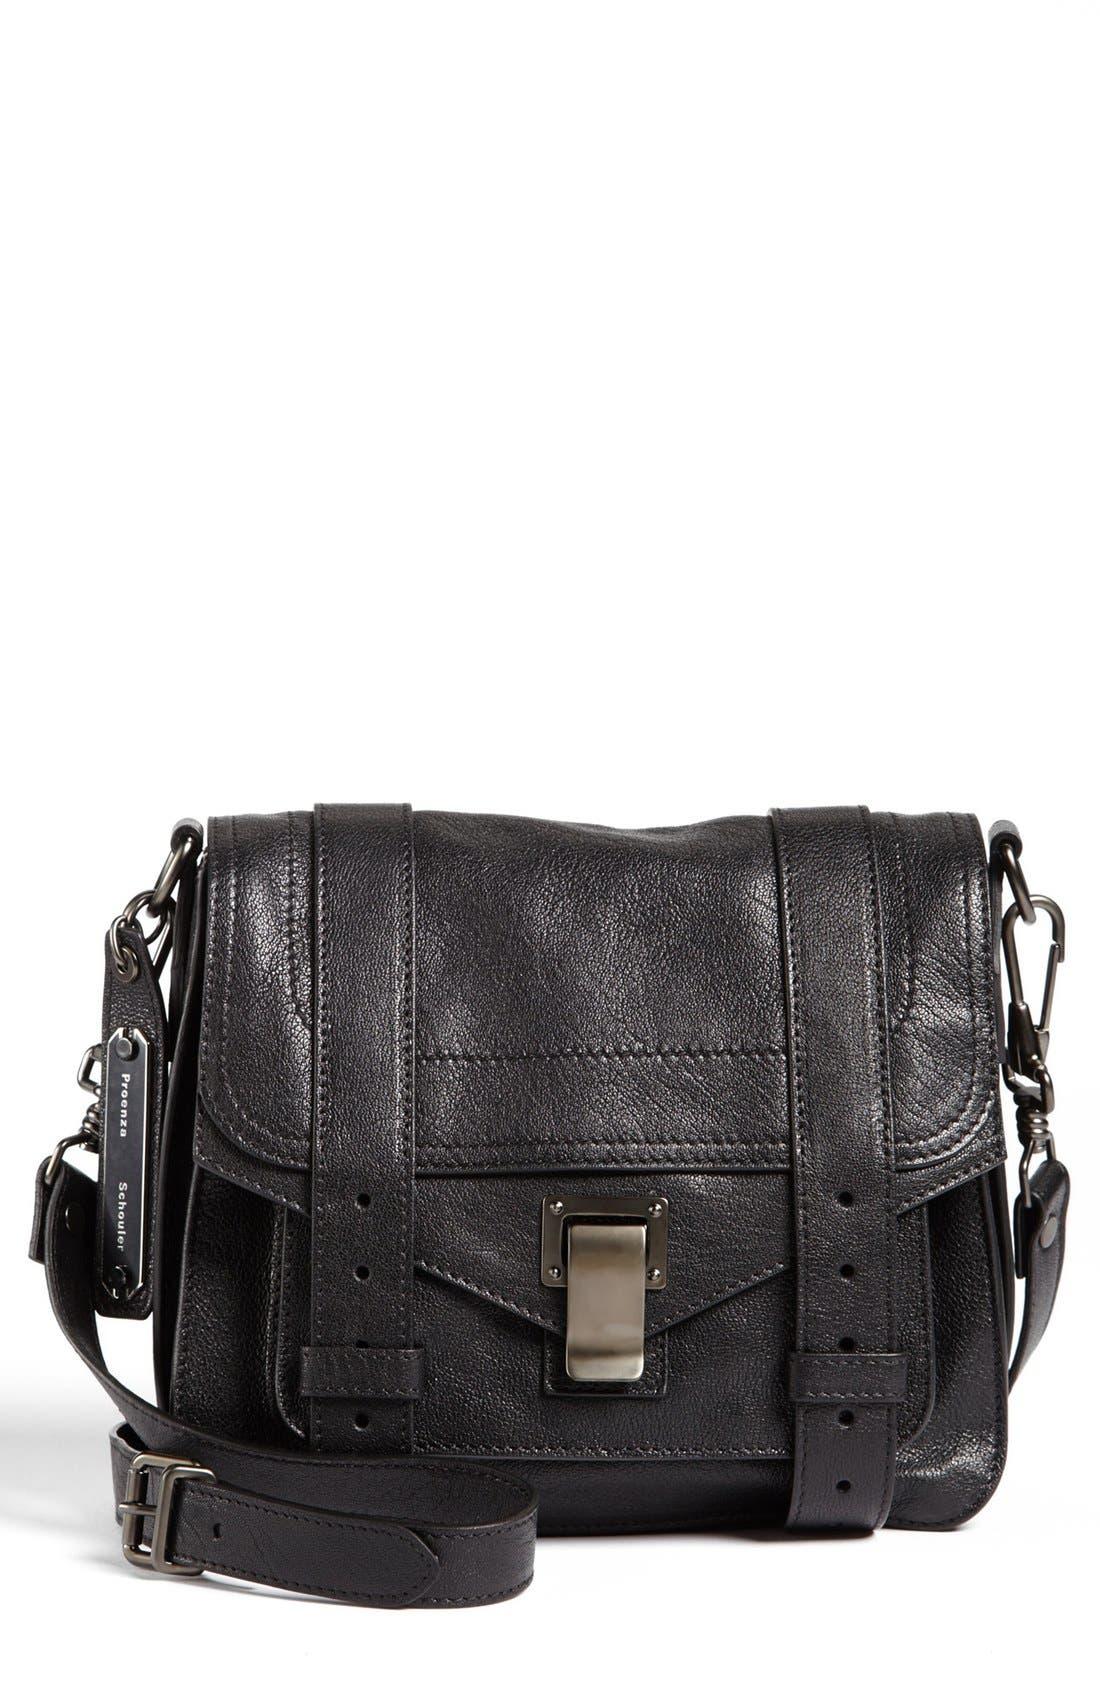 Alternate Image 1 Selected - Proenza Schouler 'PS1' Crossbody Bag